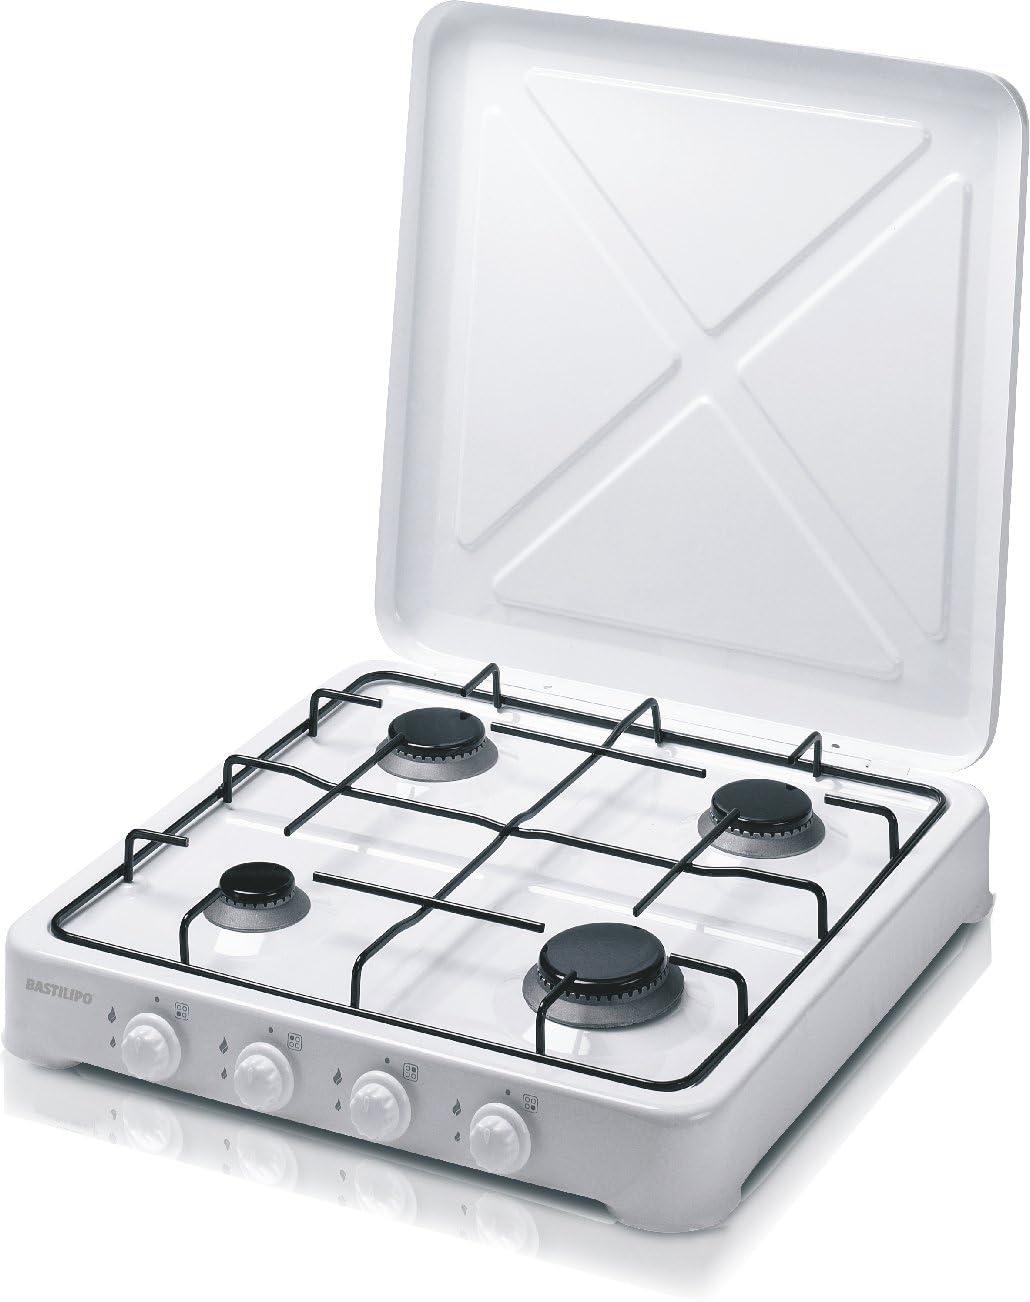 Bastilipo CG-400 Cocina de gas Butano o Propano, 4.15 W, Estructura de Acero con Doble Capa de Esmalte, Blanco